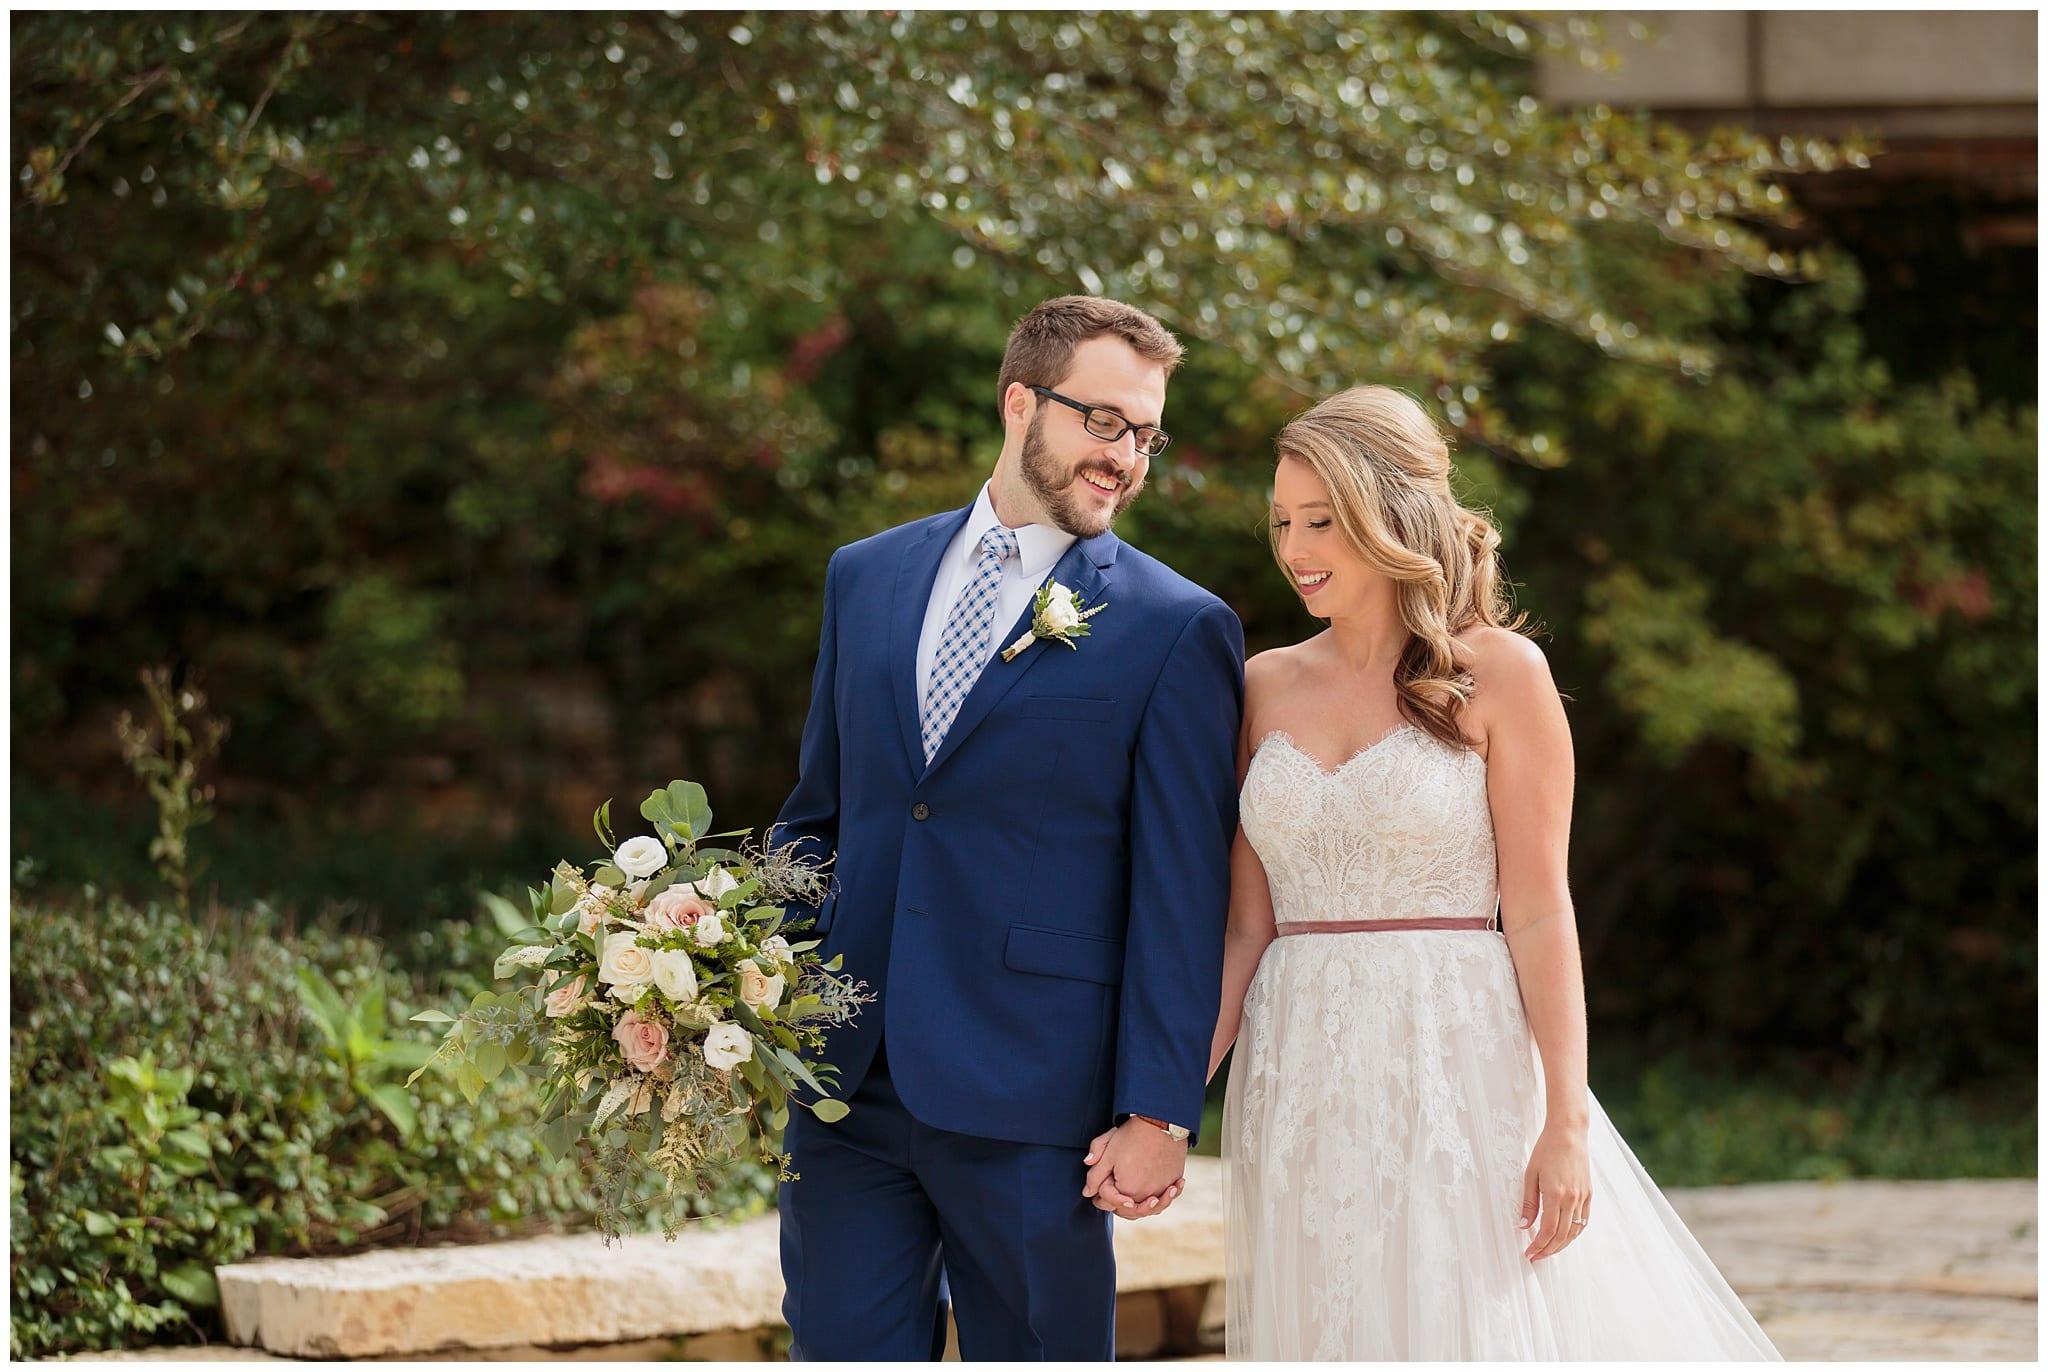 Hyatt Lodge Oak Brook Wedding Photo Shoot Wes Craft Photography